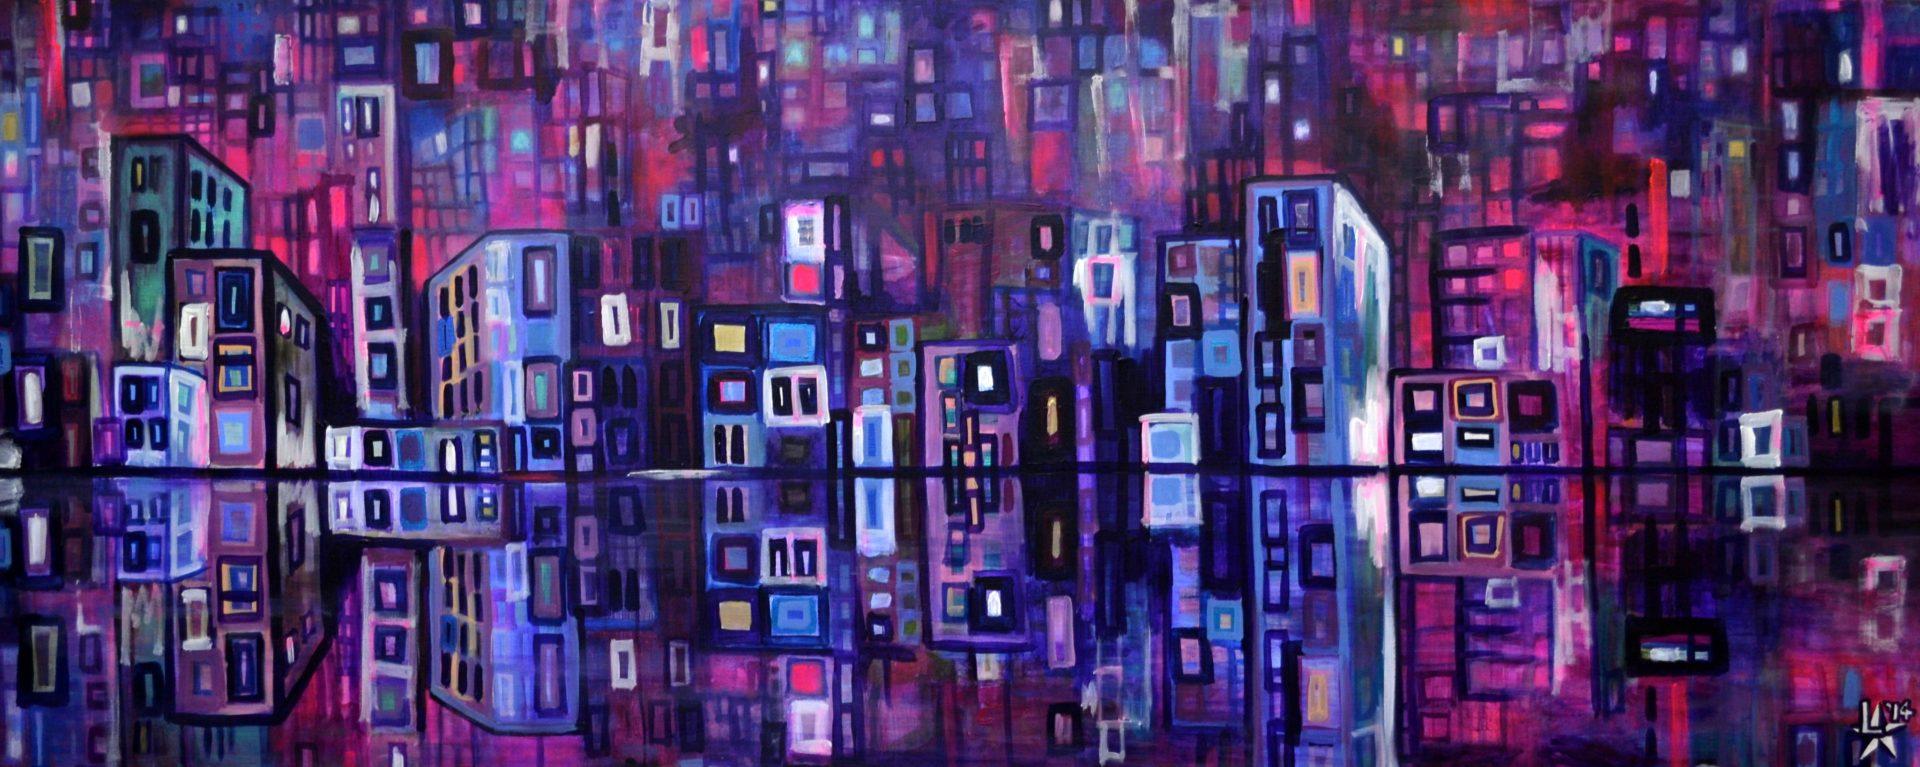 kunstenaar utrecht kunst ltuziasm l-tuziasm schilderij art artist painting urban landscape city trippin nightlife